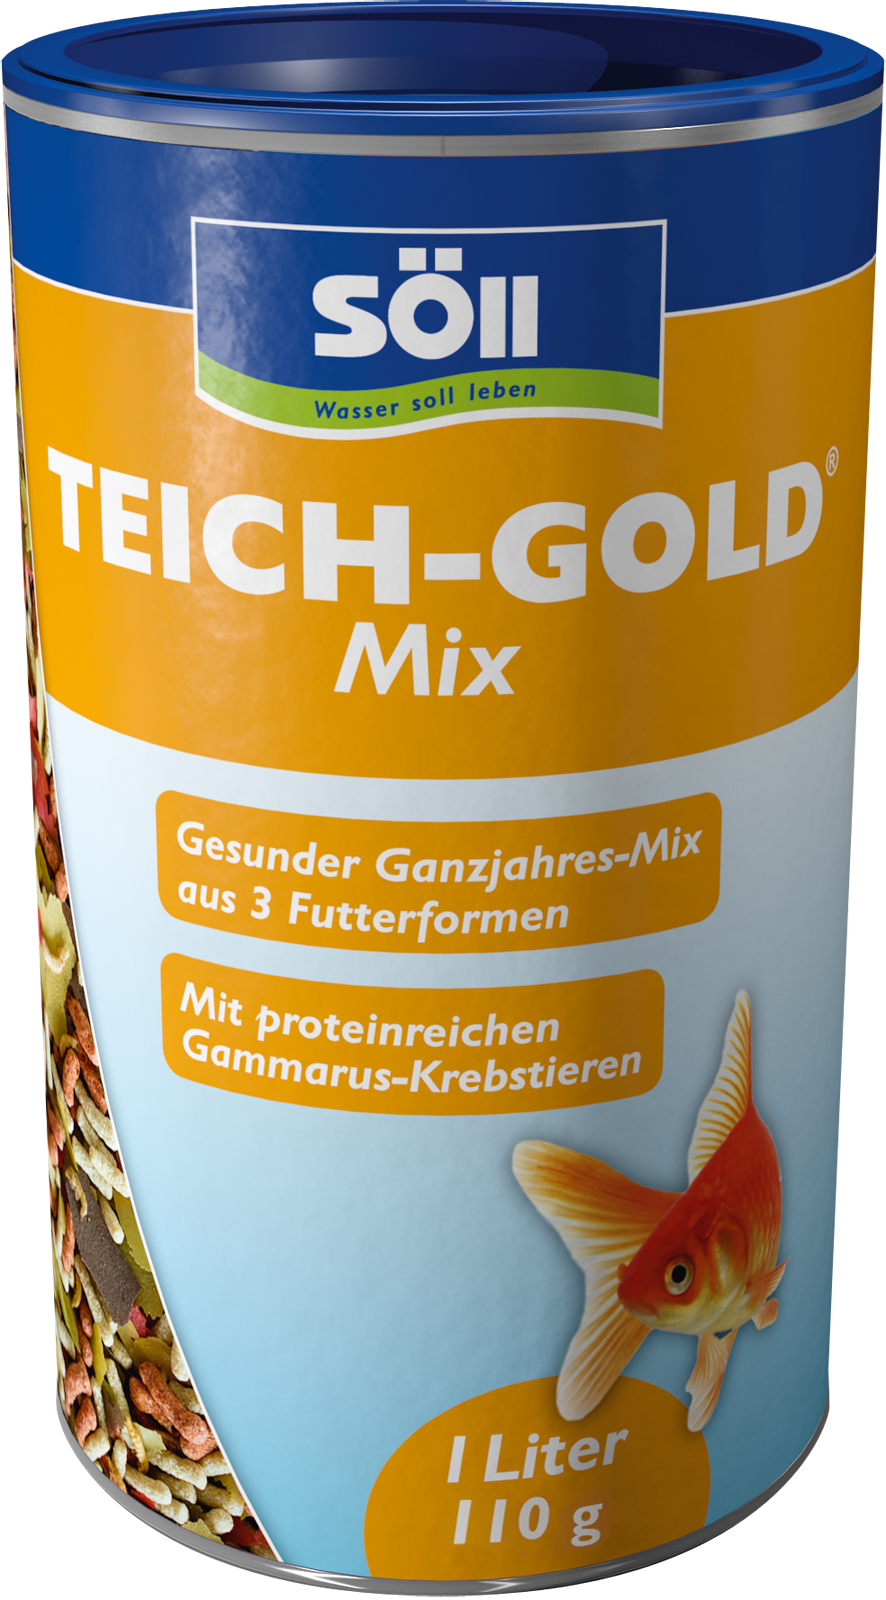 TEICH-GOLD Mix 1 Liter